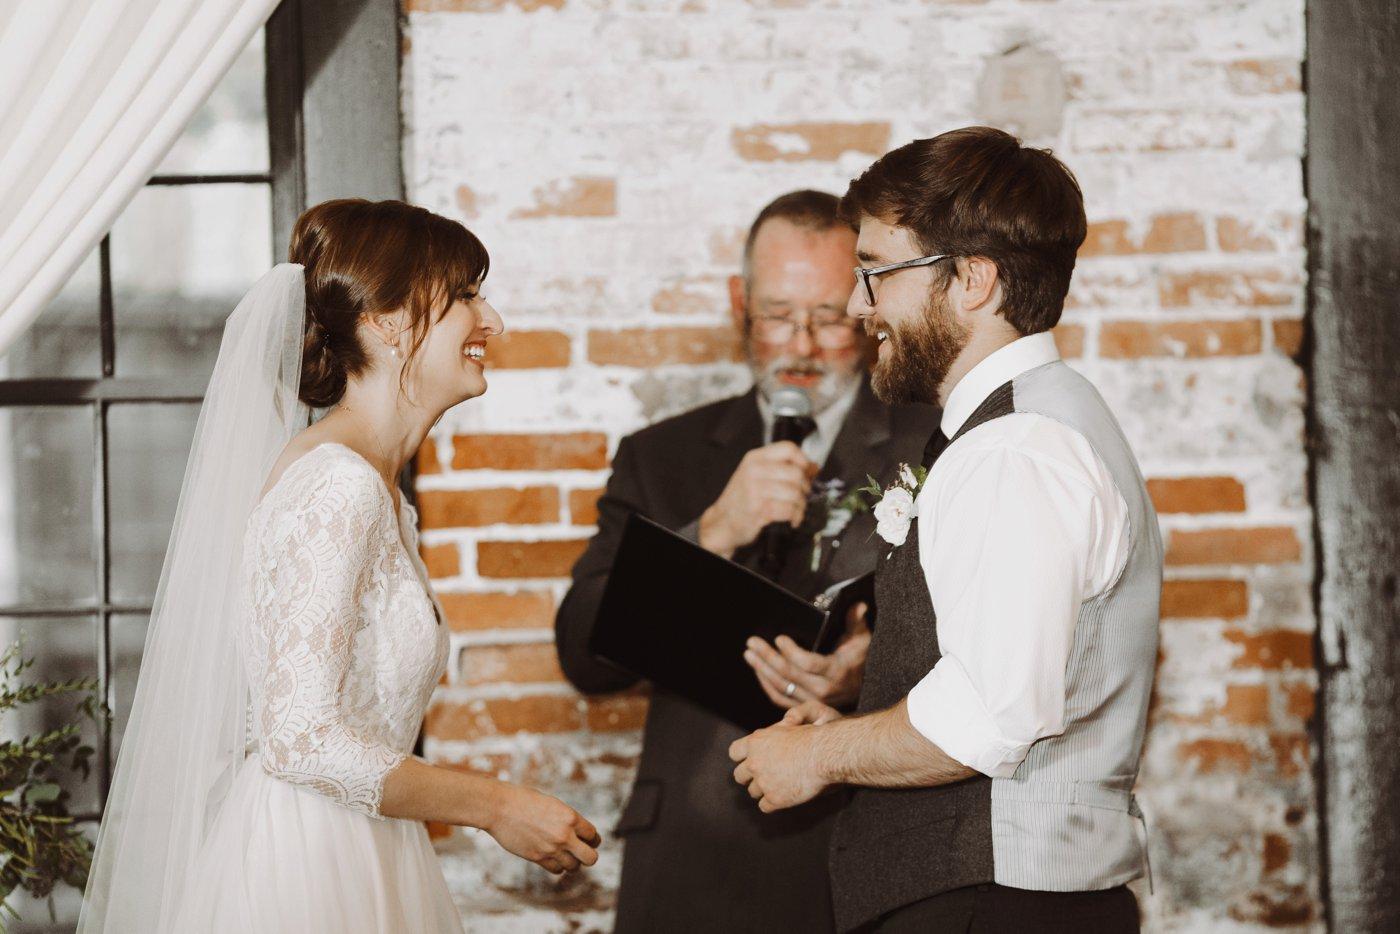 Mt. Washington Mill Dye House ceremony vows Baltimore wedding photographer